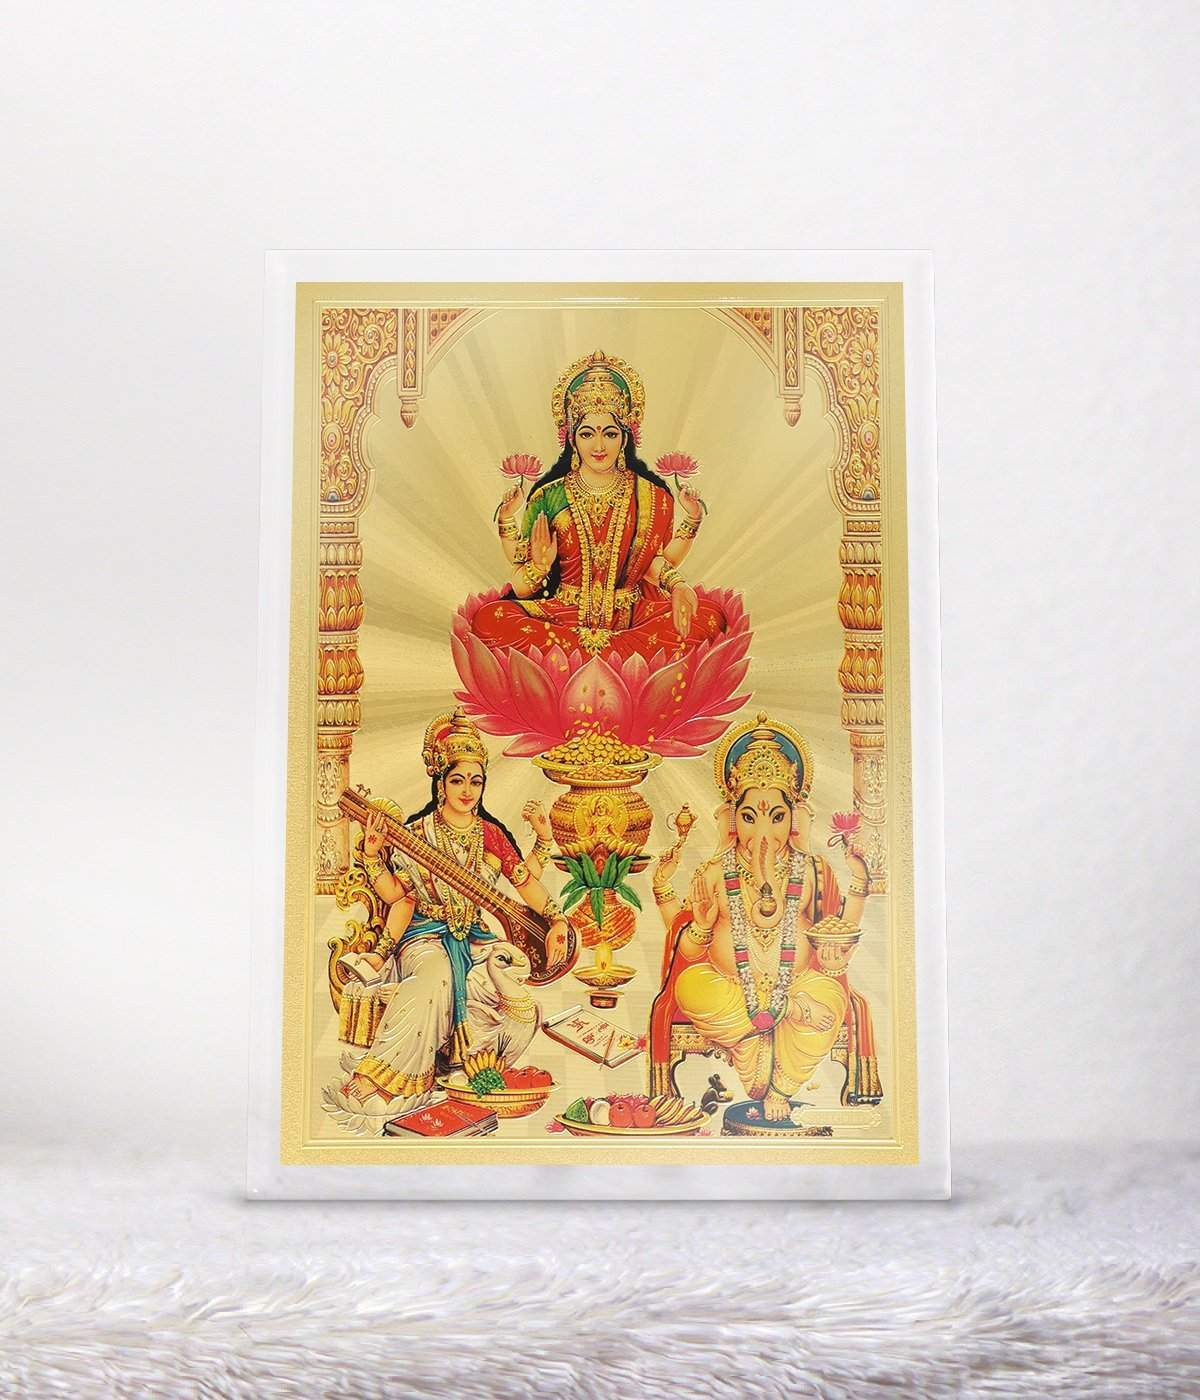 Buy Avercart Goddess Laxmi Shri Lakshmi Laxmiji Goddess Of Wealth With Ganesha Ganpati And Saraswati Ganesh Laxmi Saraswathi Poster 5x7 Table Top Acrylic Photo Frame 13x18 Cm Framed Features Price